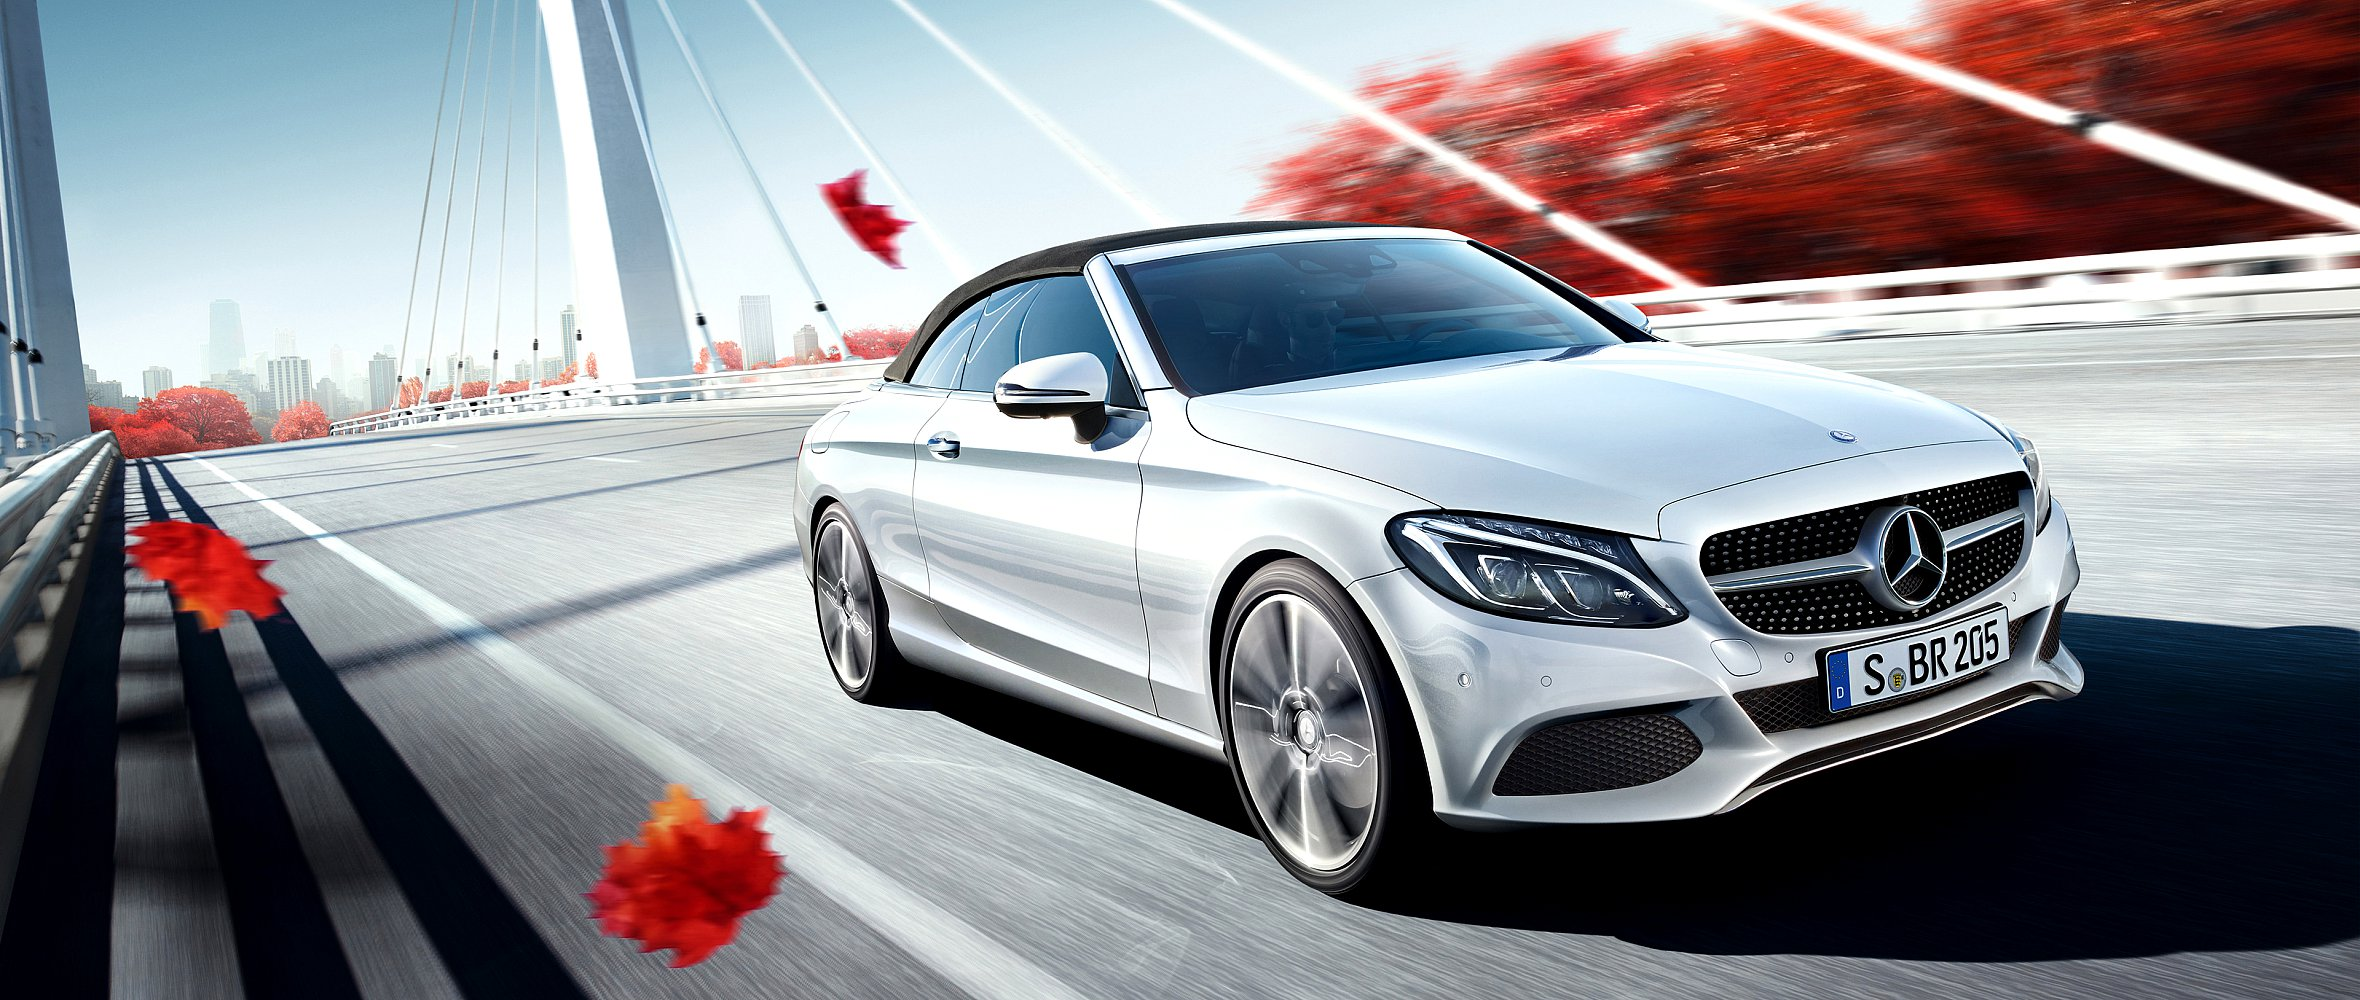 Euro Star Auto Sales